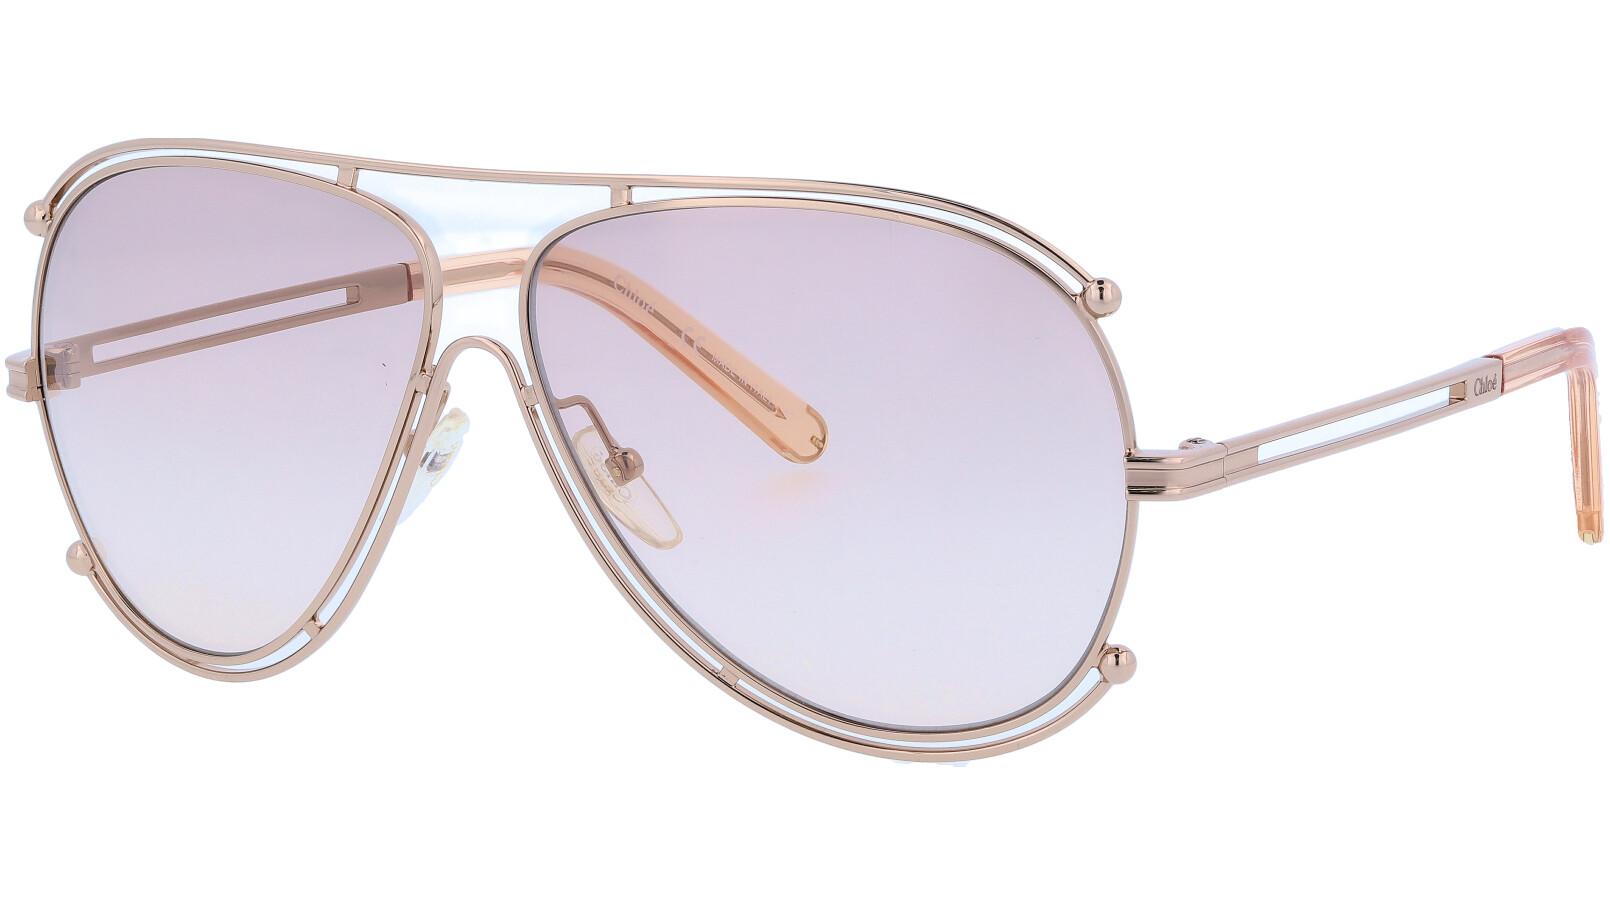 CHLOE CE121S 785 61 Rose Gold Isidora Aviator Sunglasses